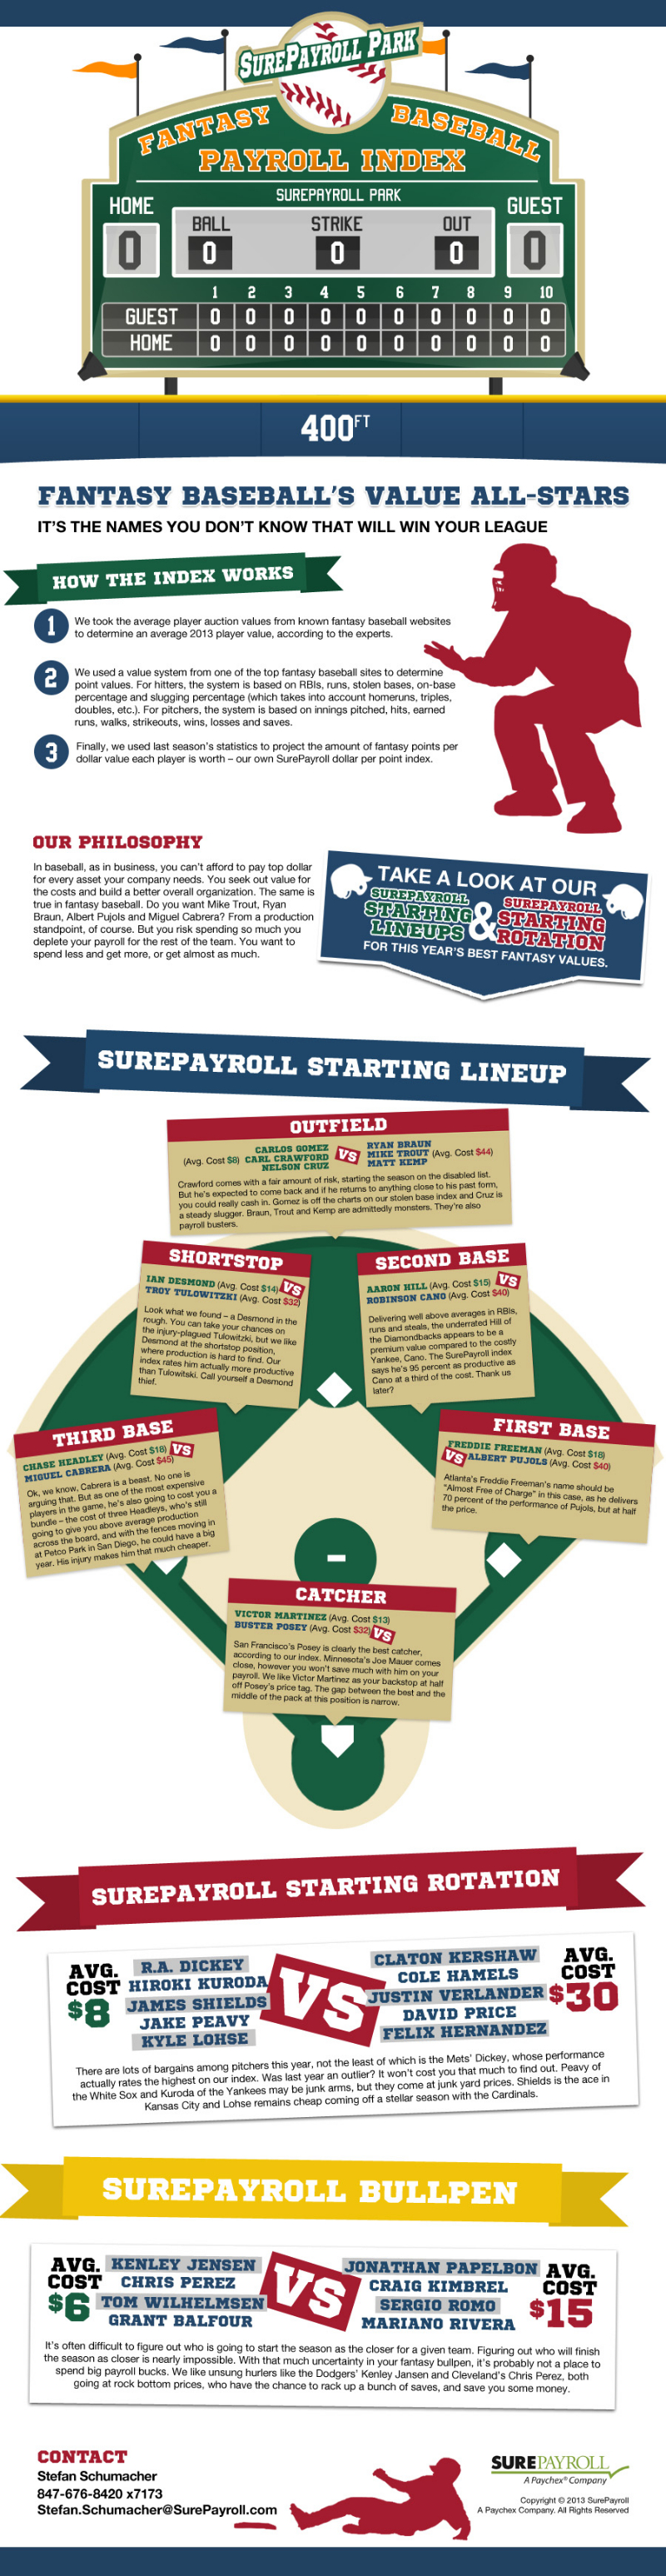 Fantasy Baseball Statistics